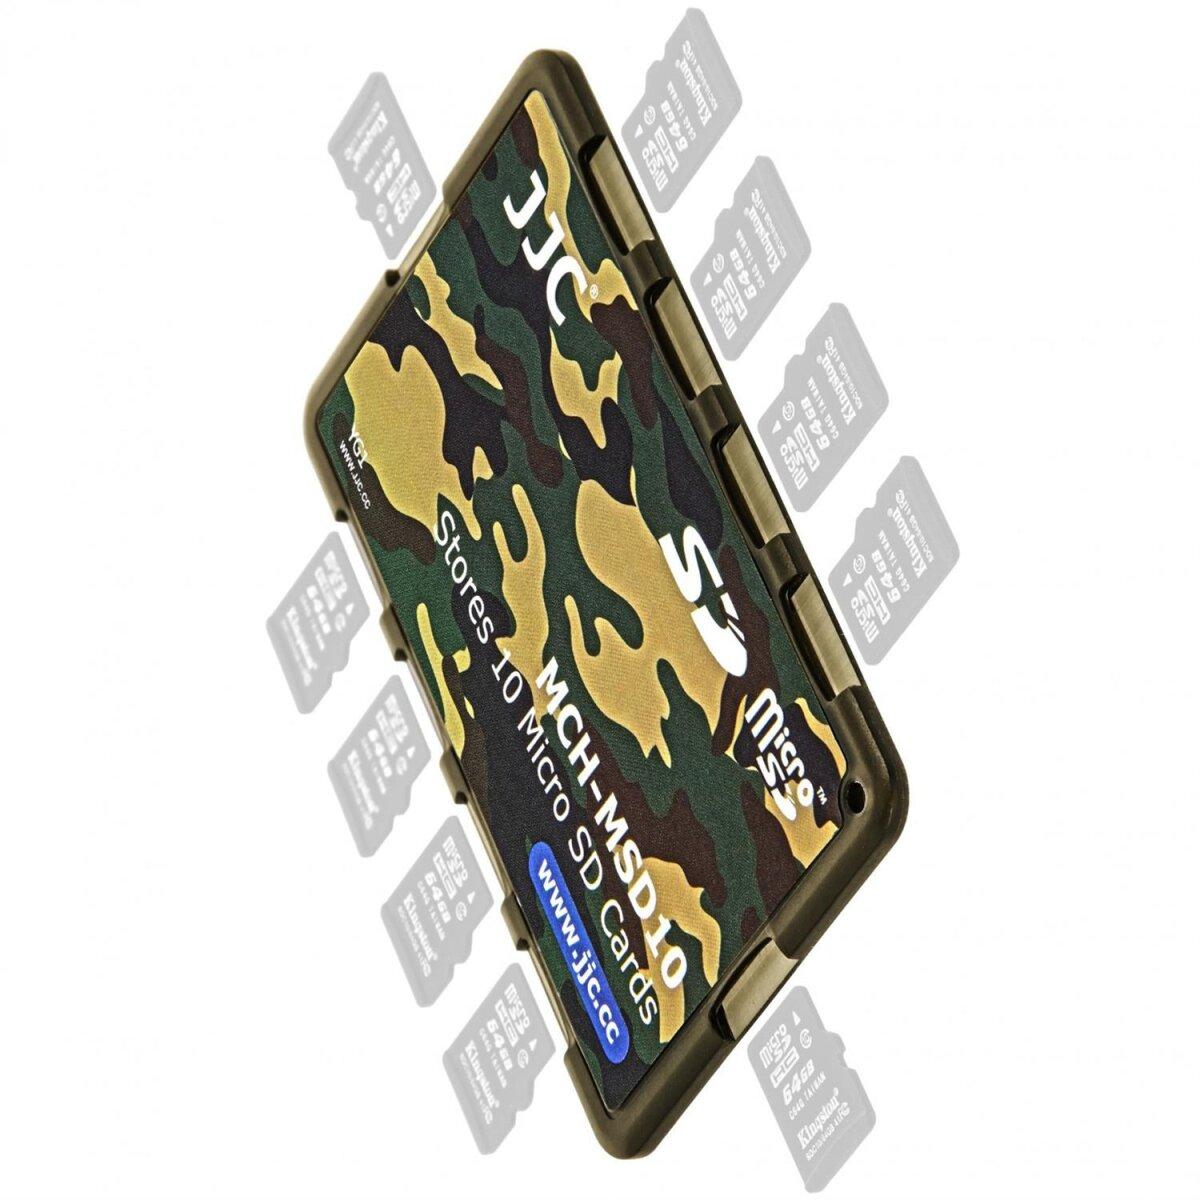 JJC extrem Kompaktes Speicherkartenetui Aufbewahrungsbox im Kreditkarten-Format fuer 10 x MicroSD - Farbe Flecktarn